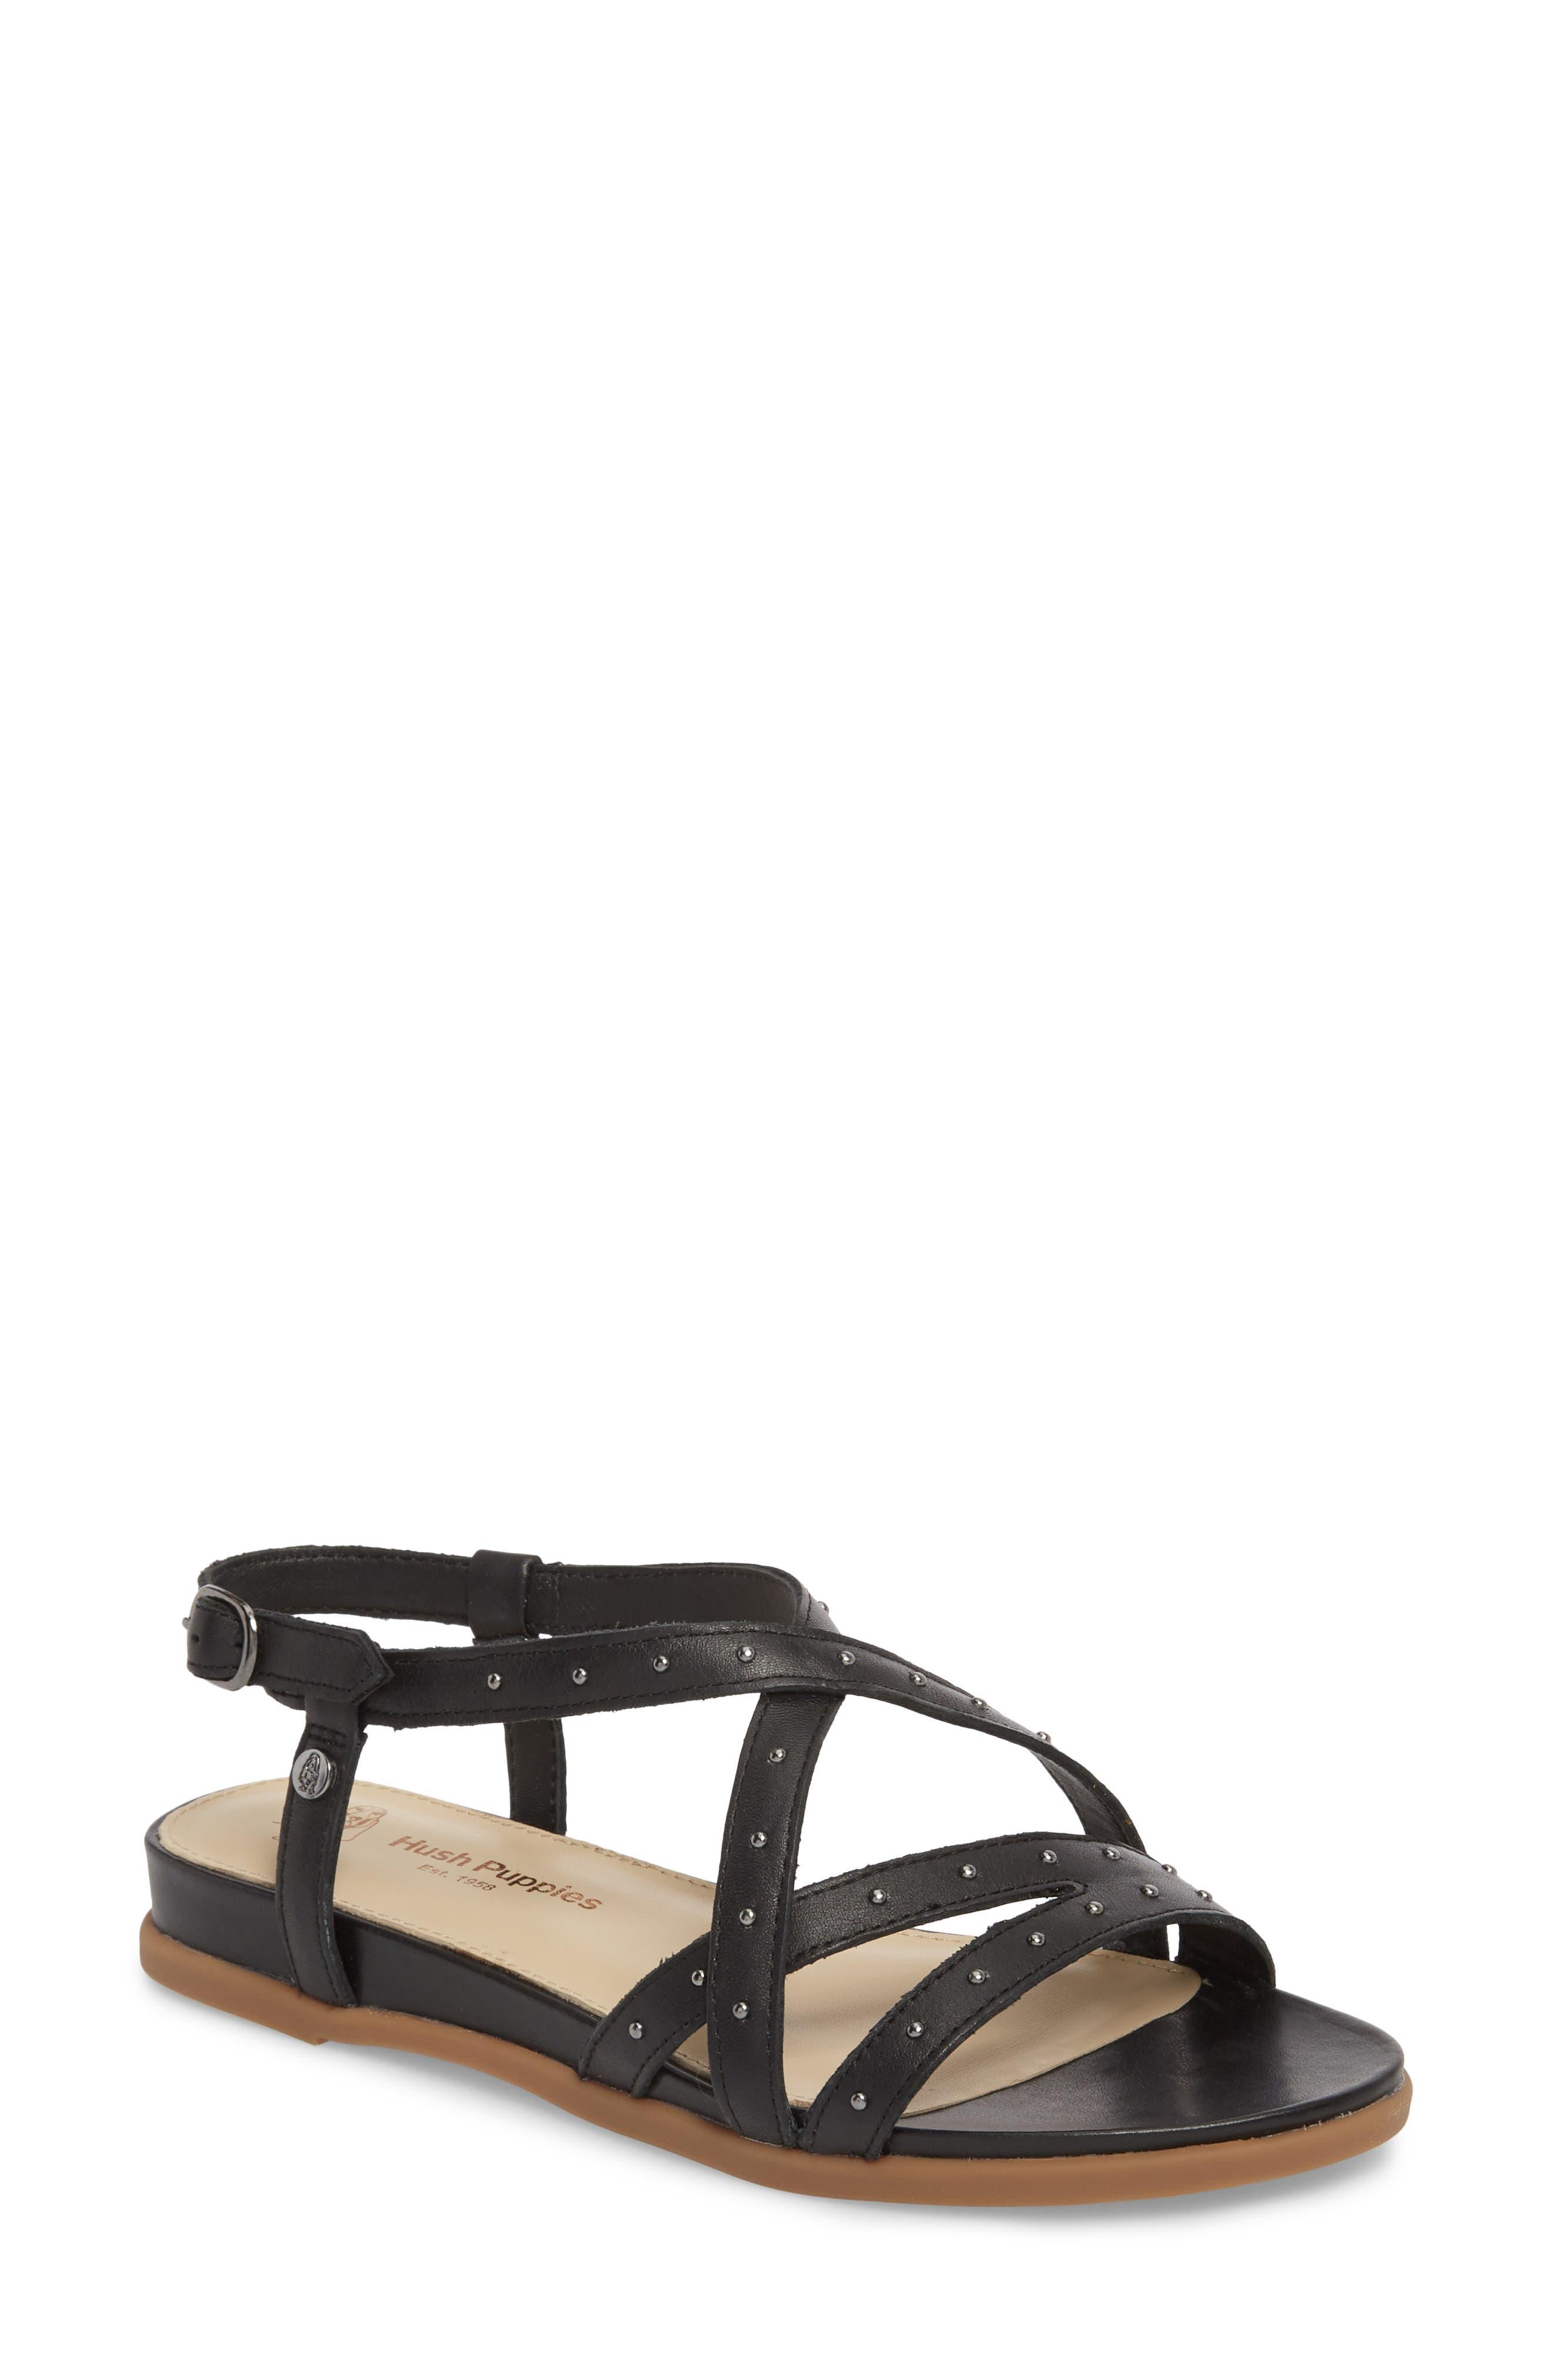 Dalmatian Studded Sandal,                         Main,                         color,